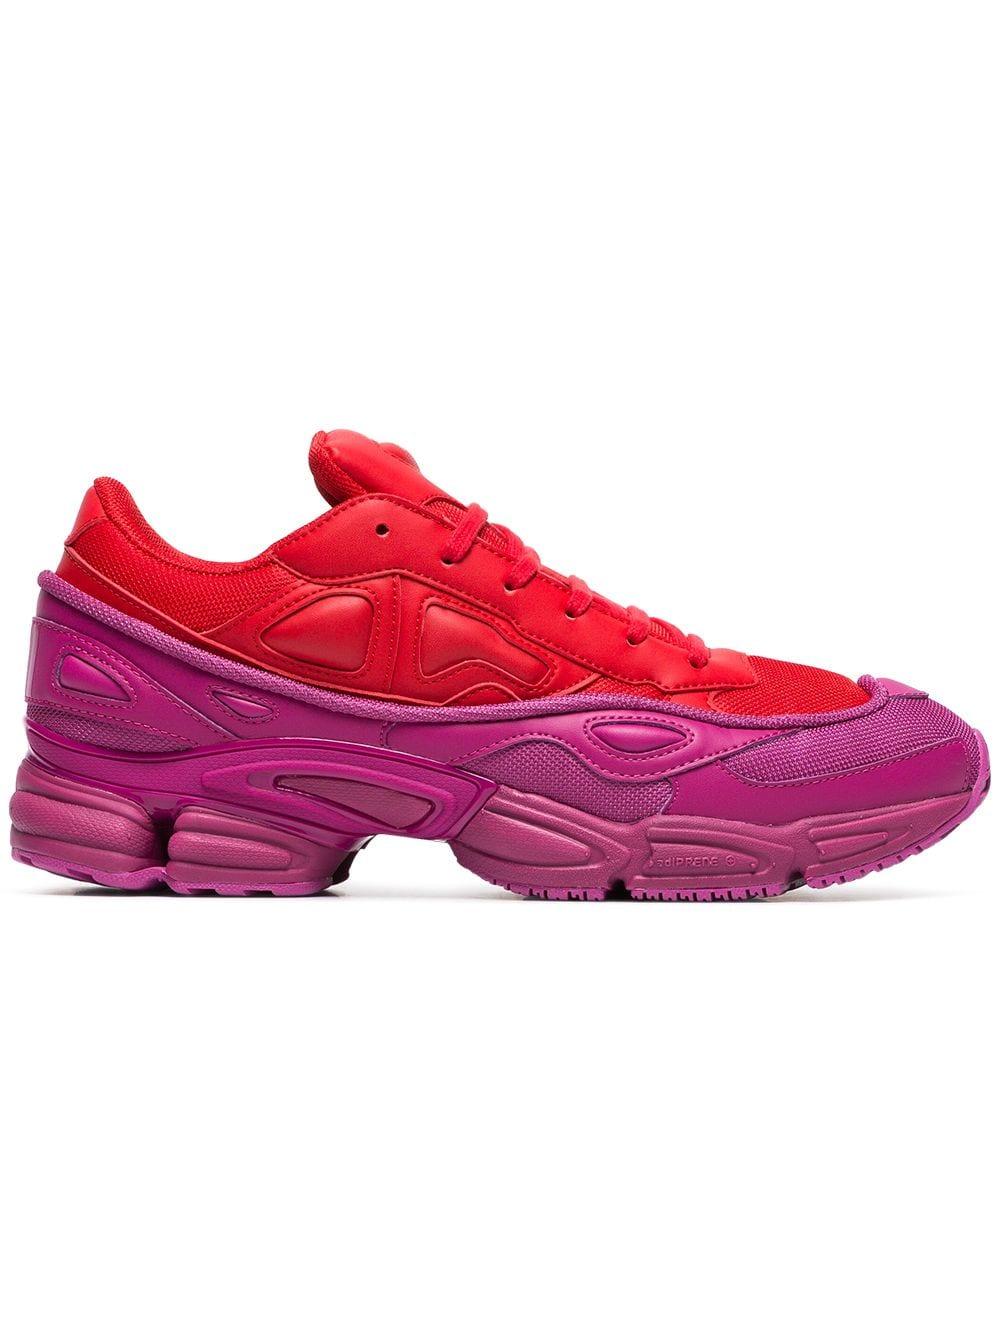 Adidas By Raf Simons Ozweego rode en roze leren sneakers - Rood